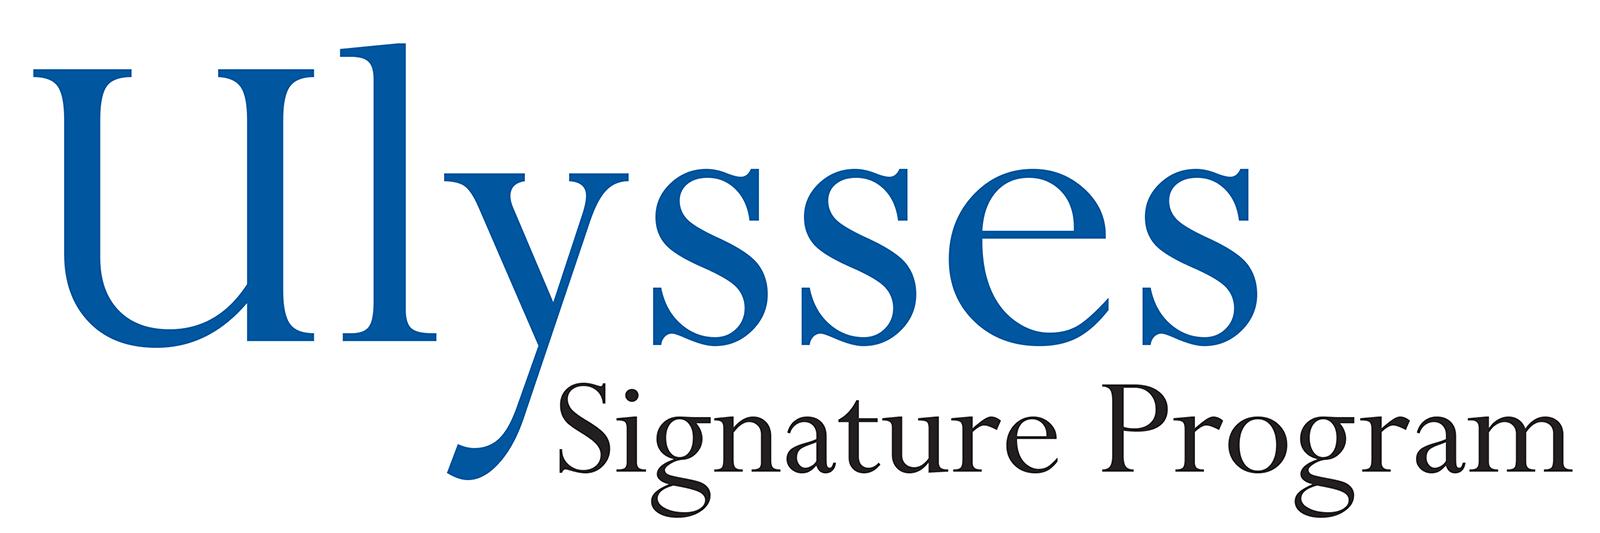 home ulysses signature program northwest high libguides